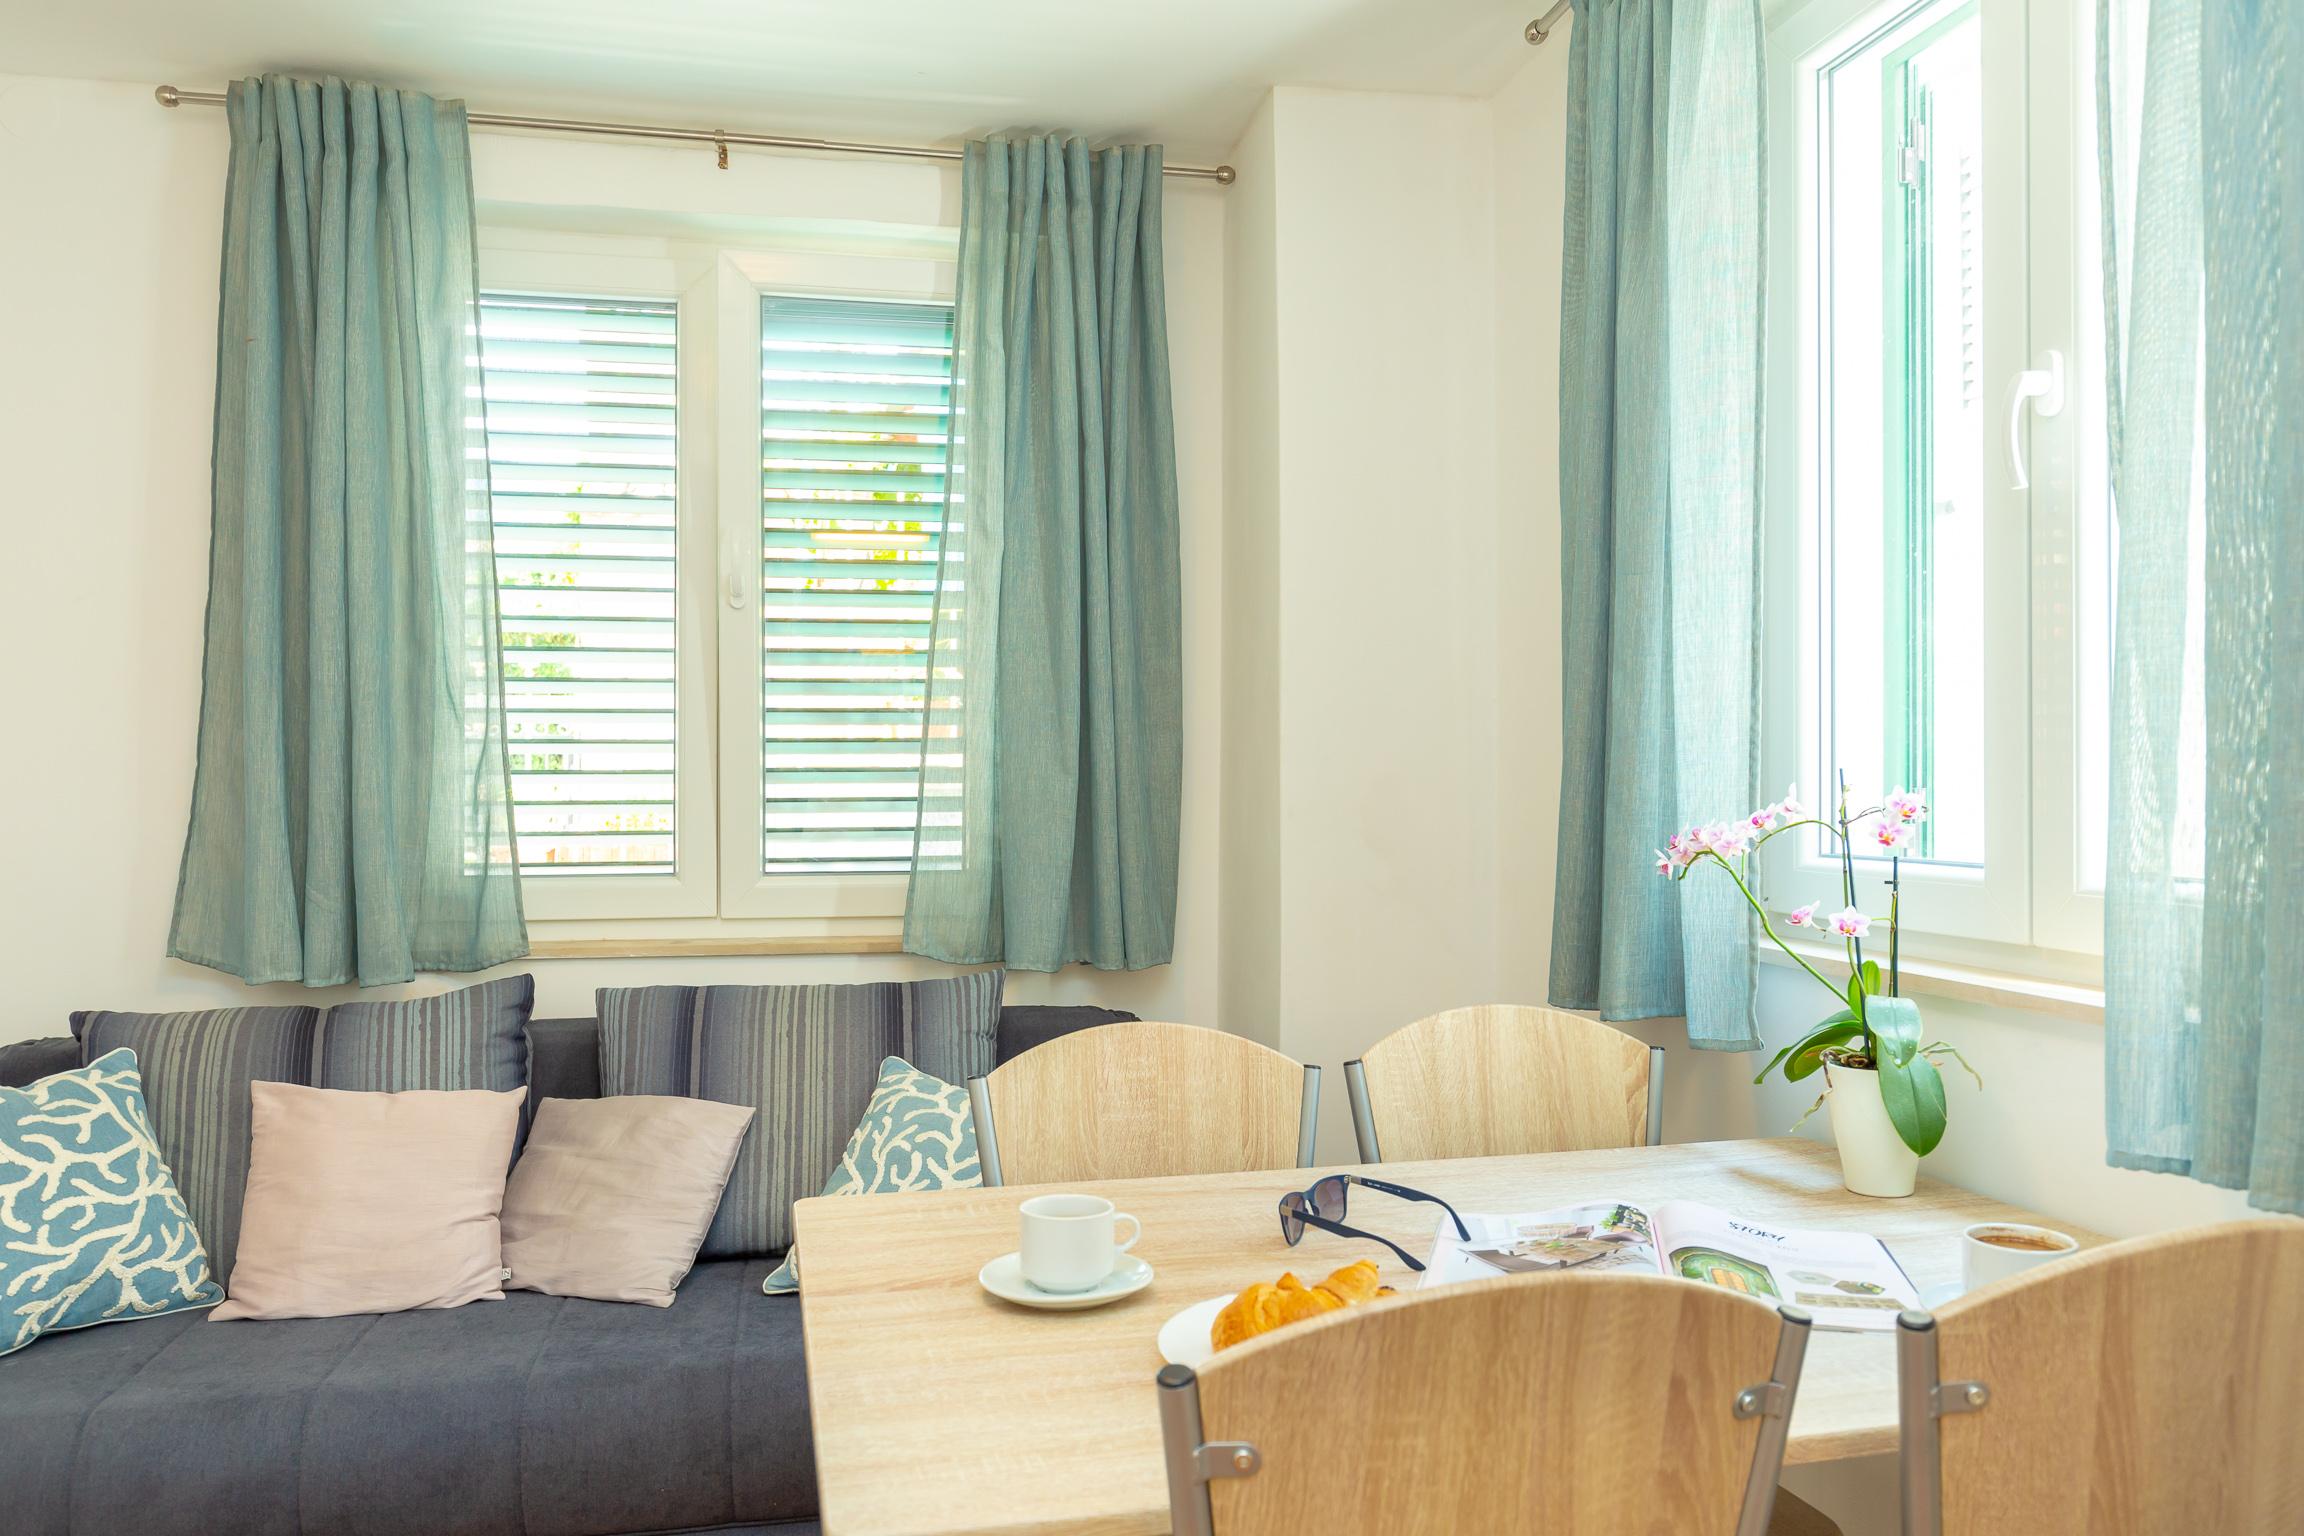 Apartamente Apartment Colette 50088, Dubrovnik, Dubrovnik, Regiunea Dubrovnic-Neretva